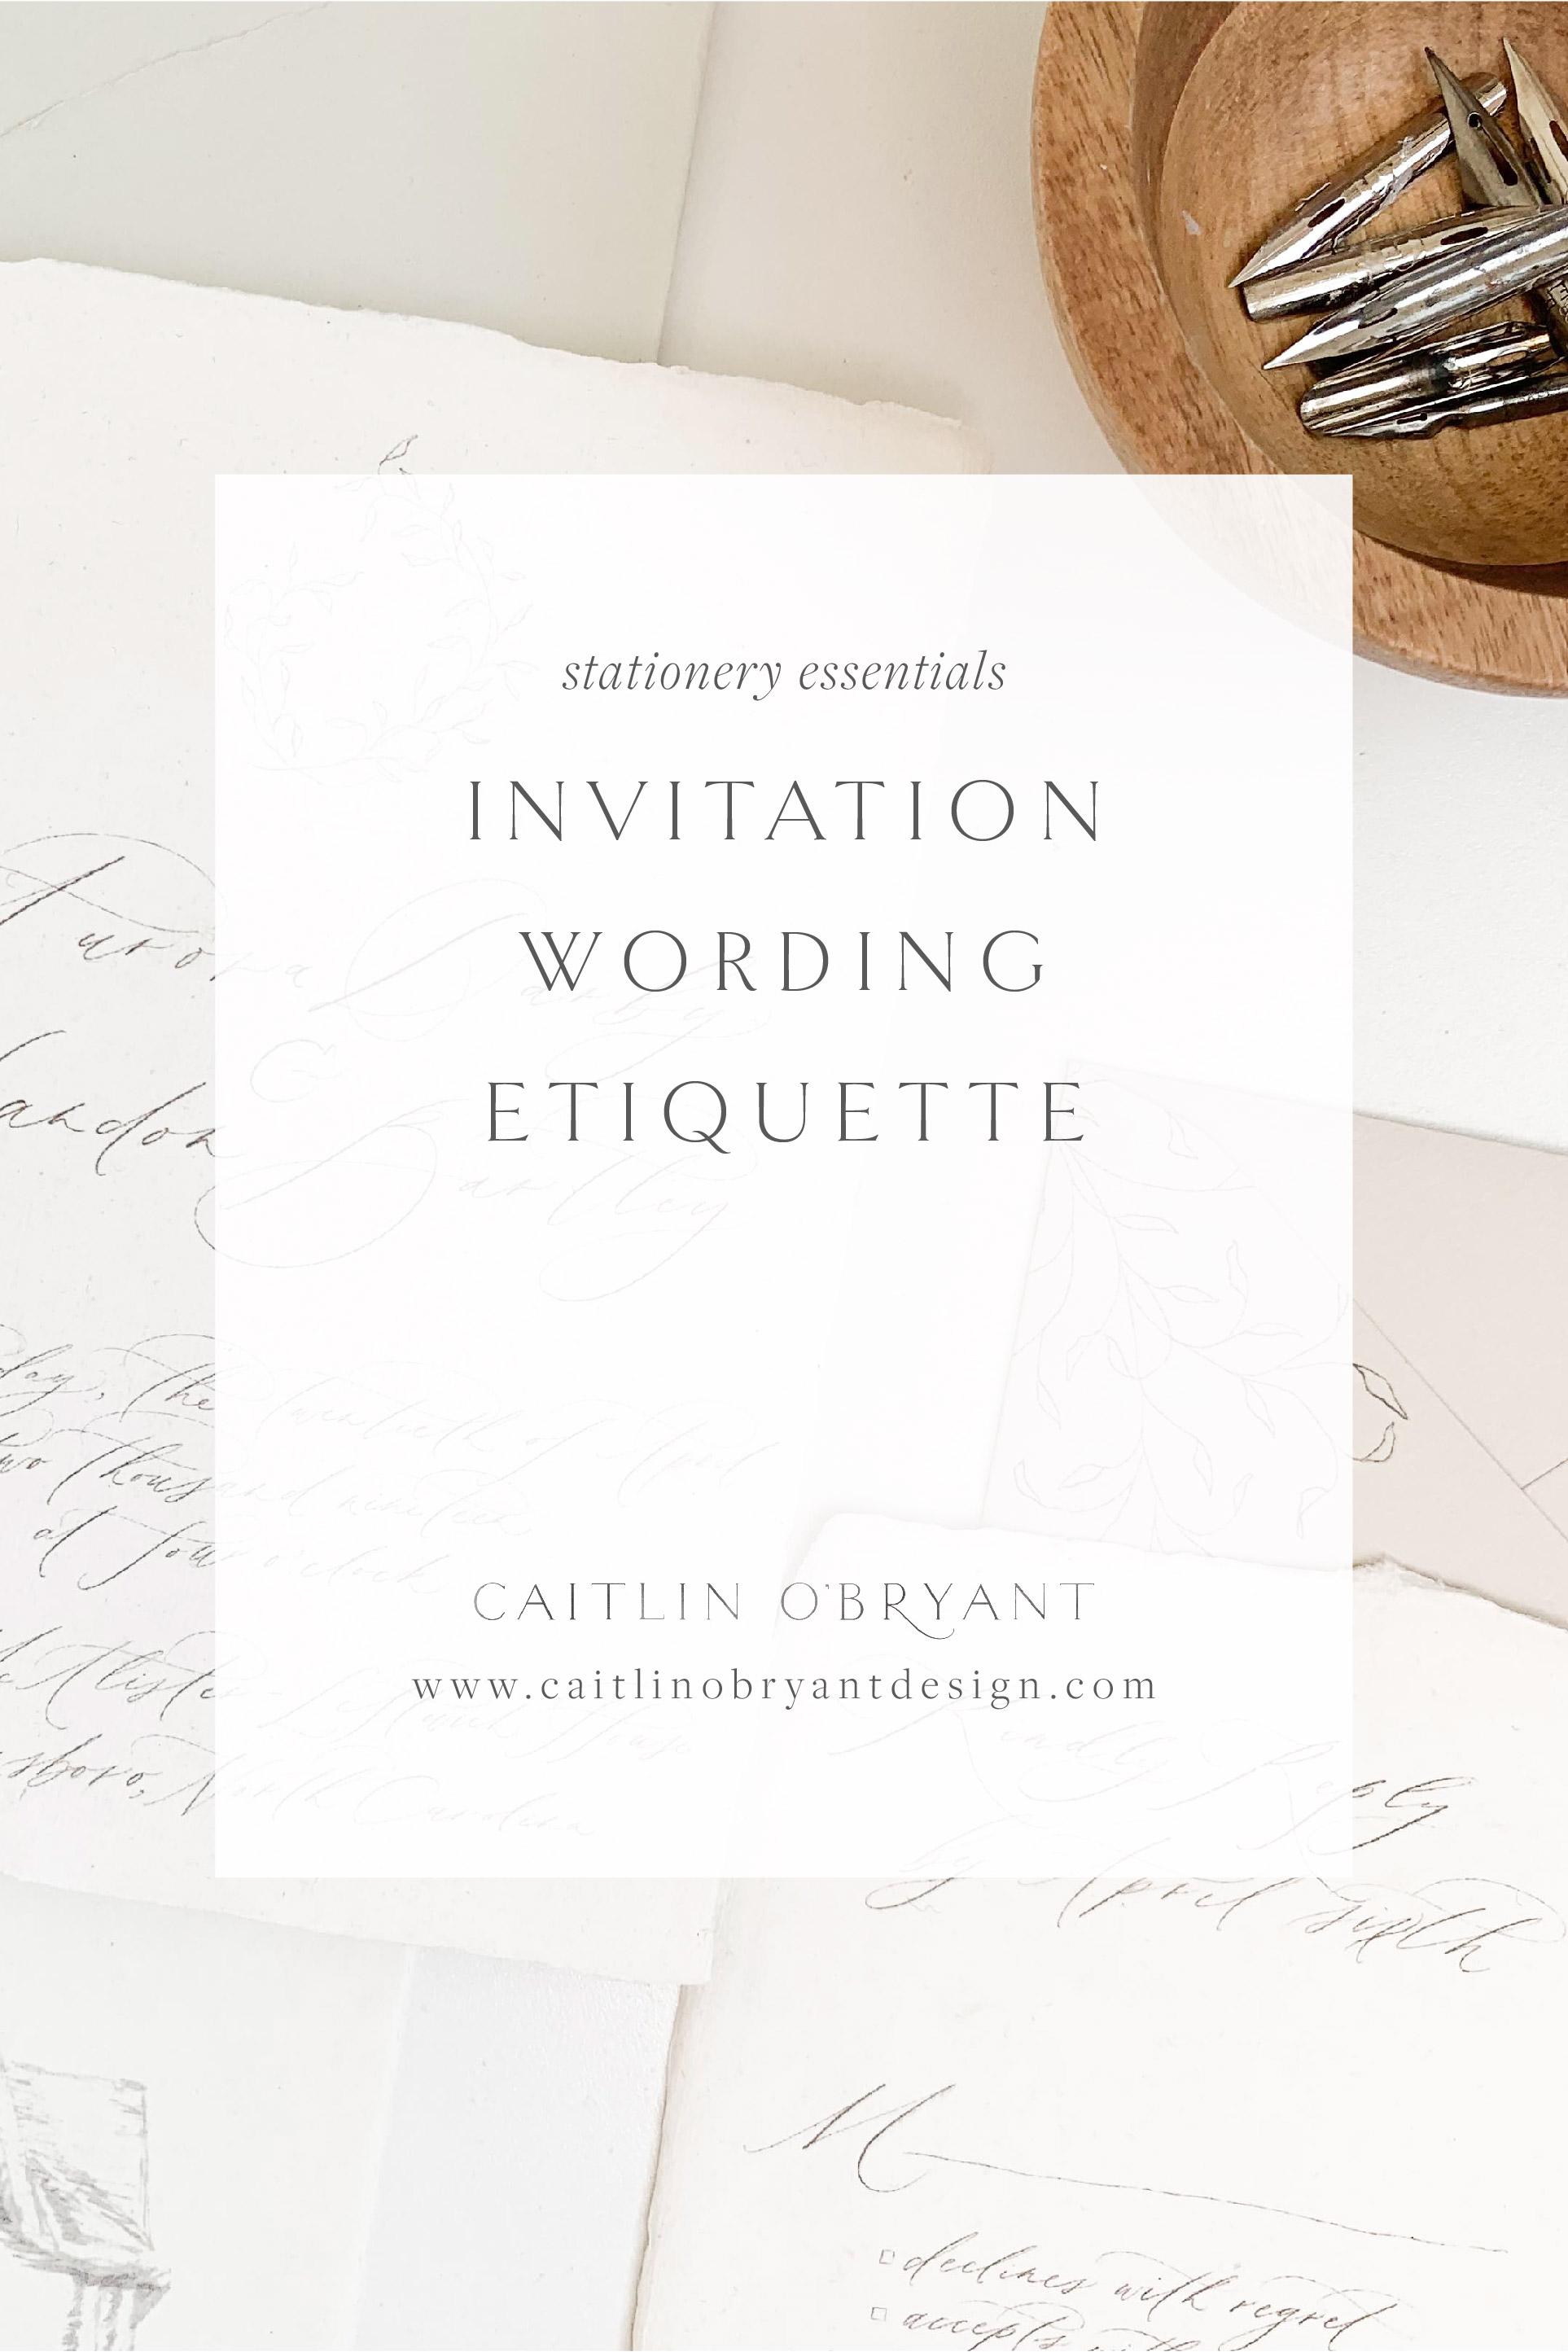 Etiquette for Wording Wedding Invitations by Caitlin O'Bryant Design. Formal and informal wedding invitation etiquette.